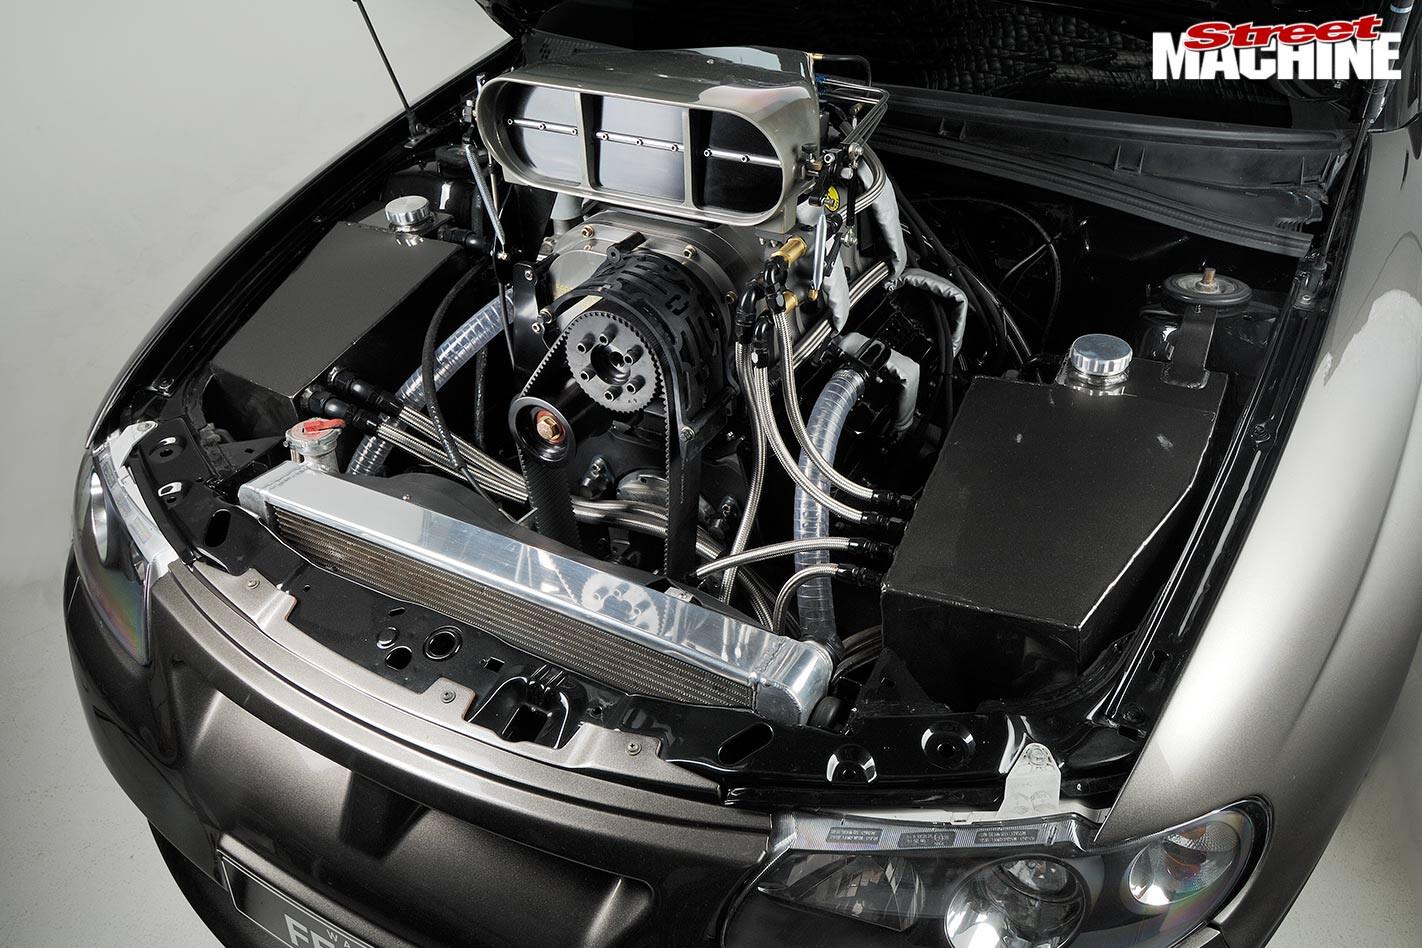 HSV GTO engine bay